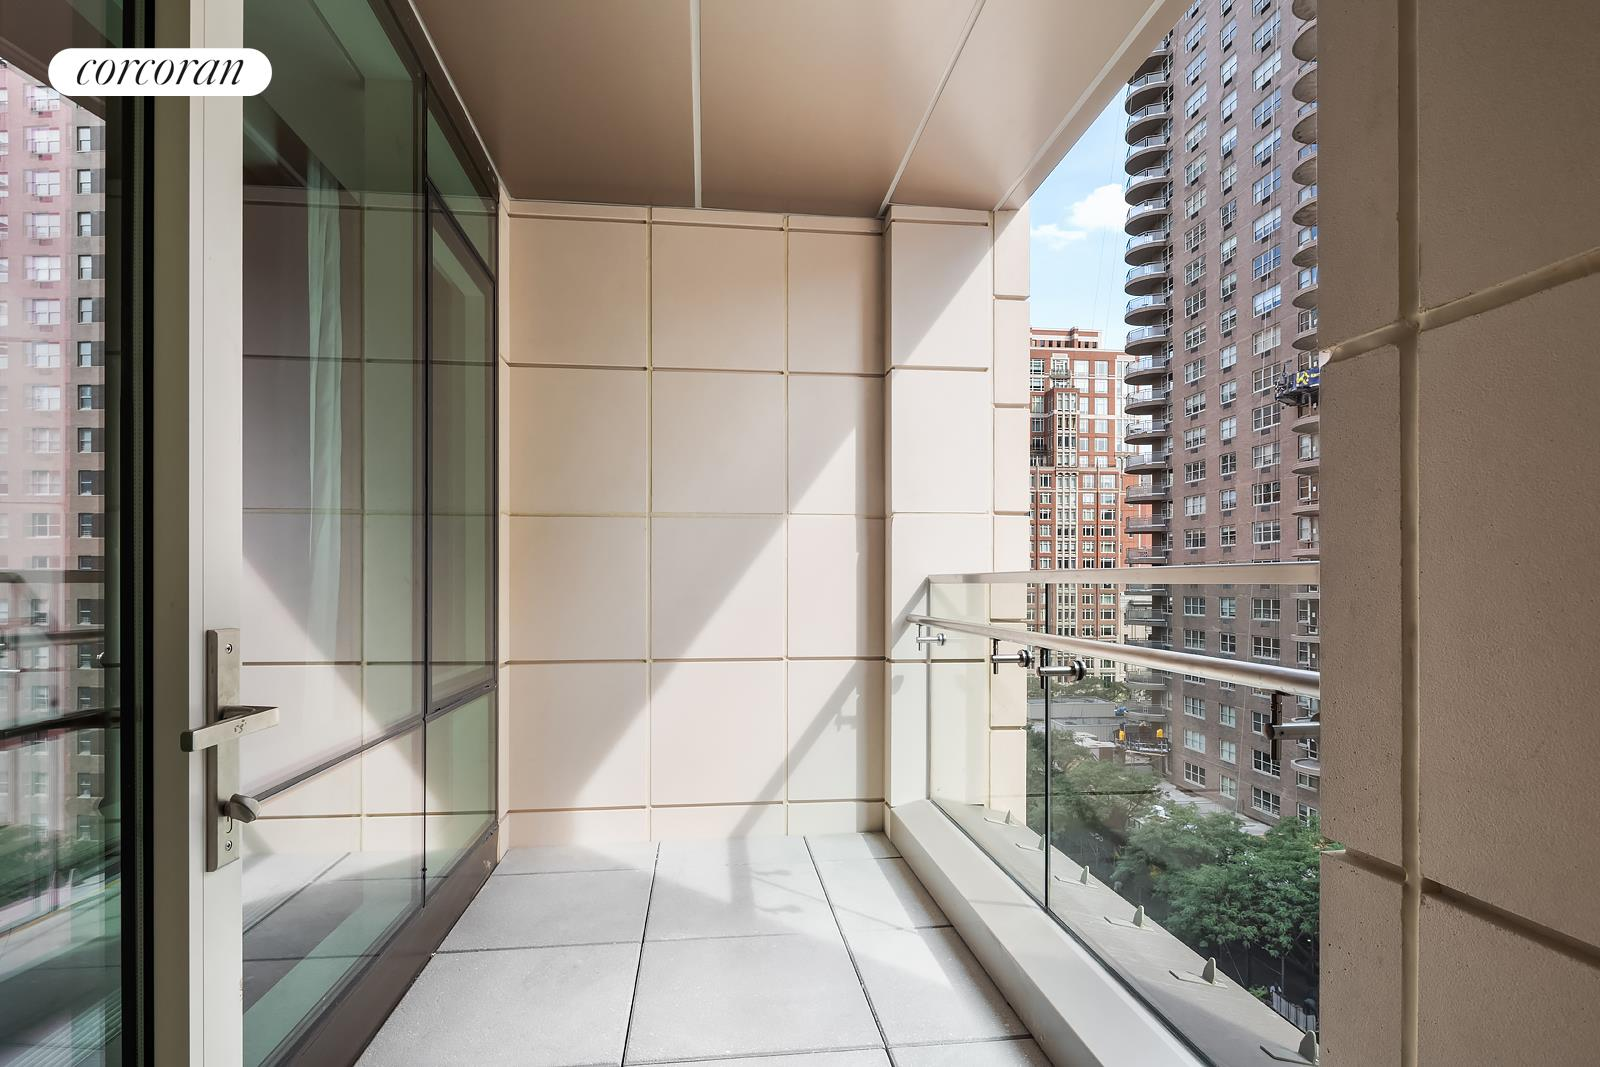 1289 Lexington Avenue Upper East Side New York NY 10028